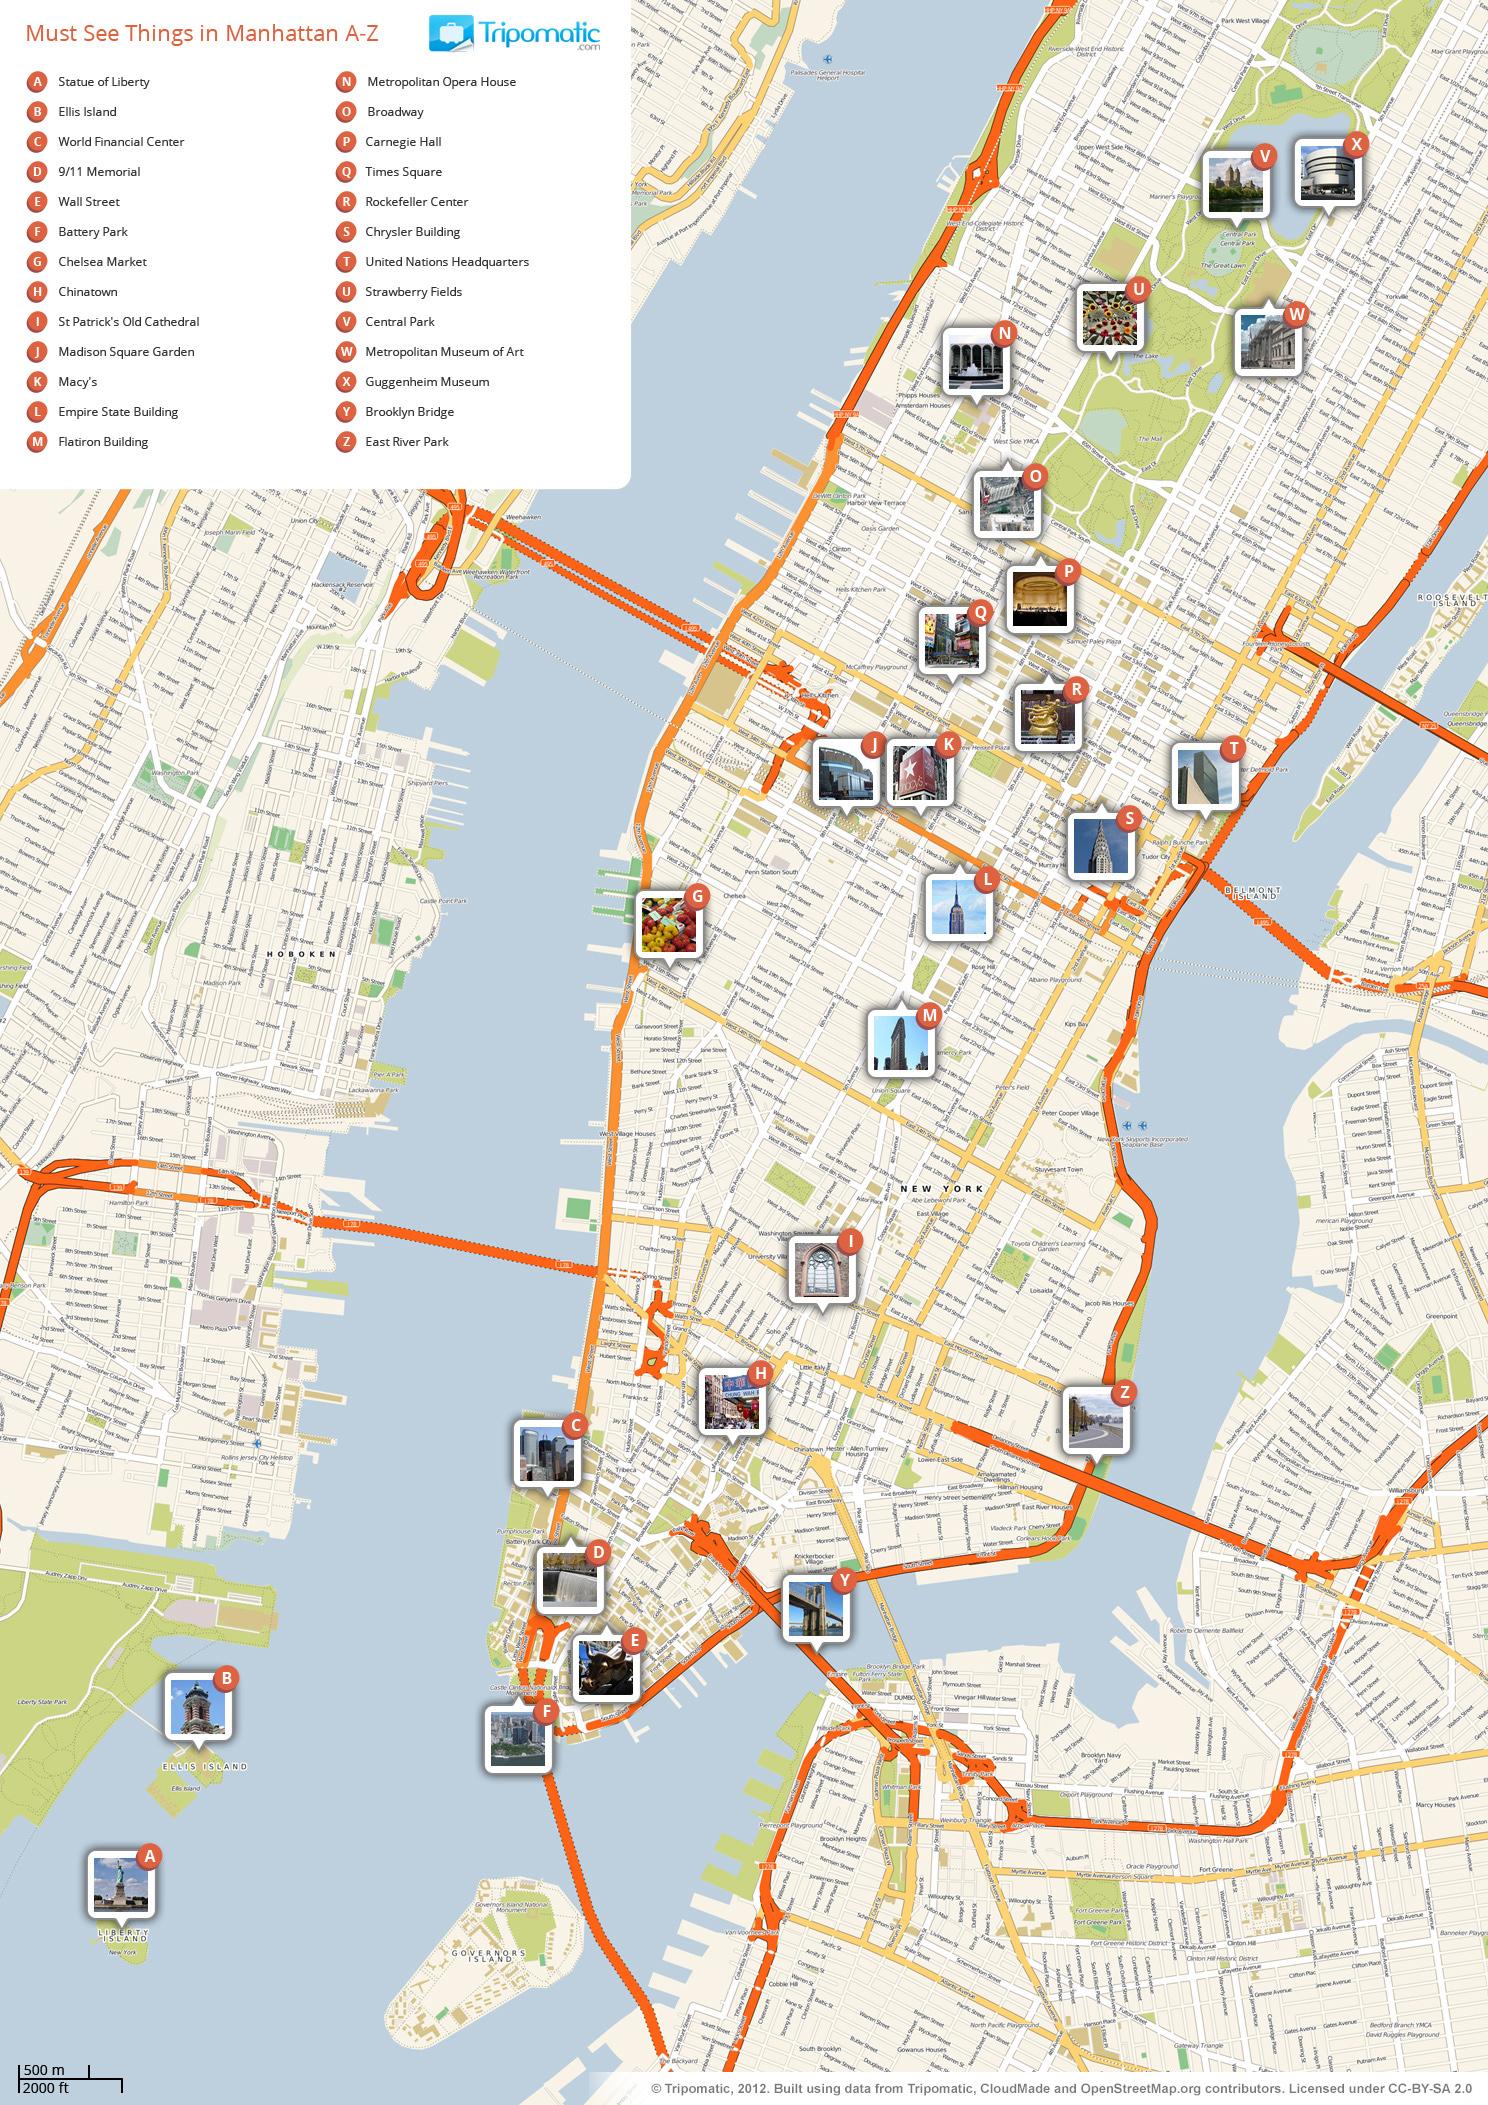 File:new York Manhattan Printable Tourist Attractions Map - Printable Tourist Map Of Manhattan